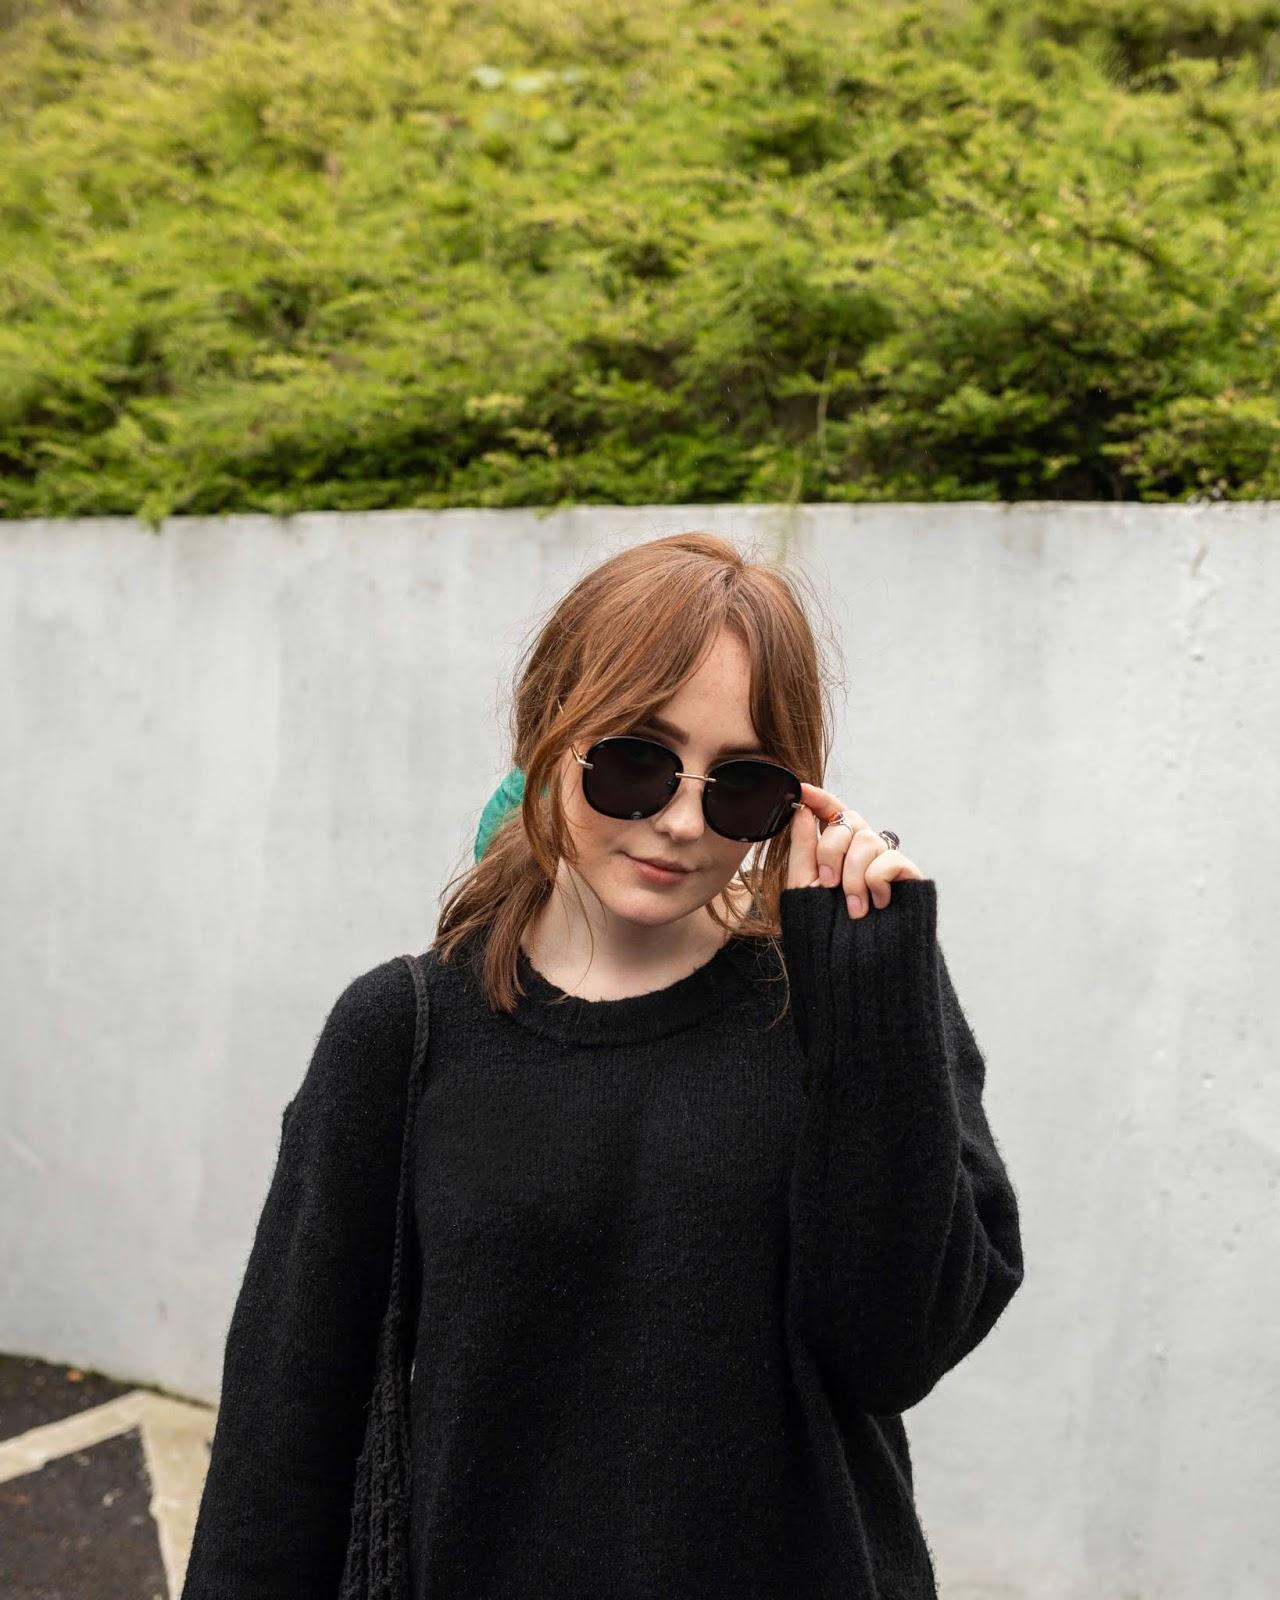 blogger wearing black sunglasses and oversized black jumper